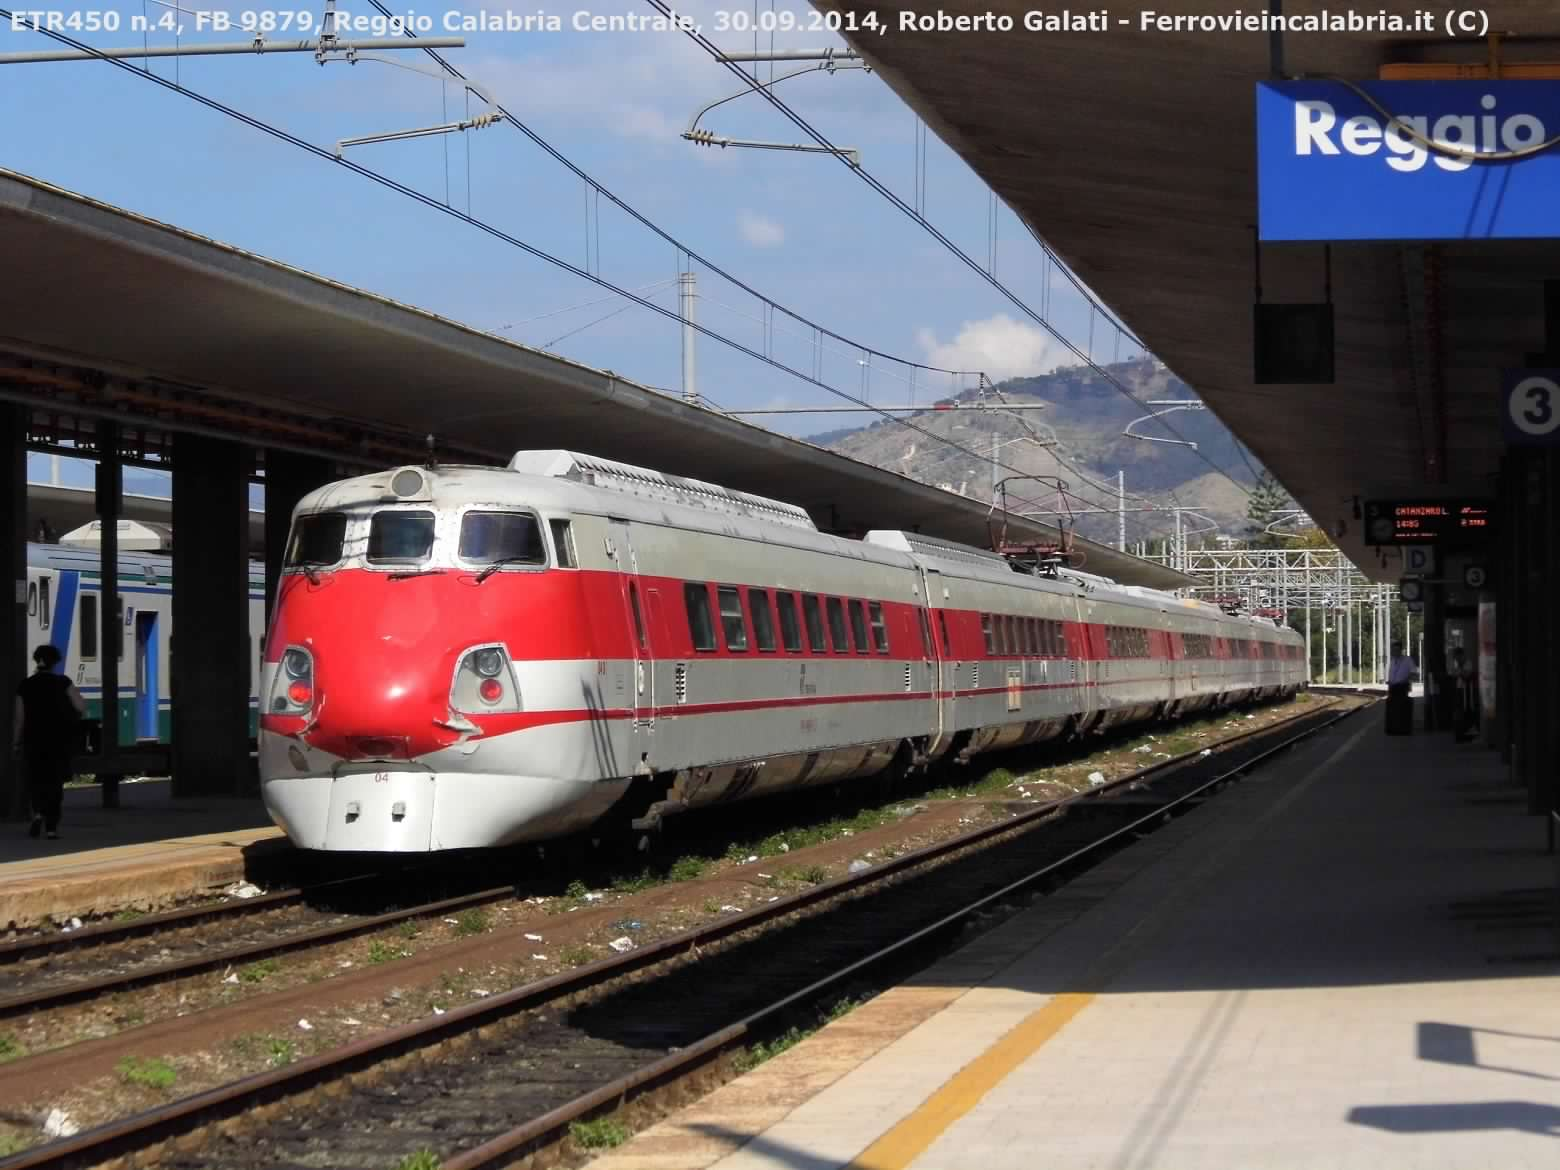 ETR450 04-ReggioCalabriaCentrale-FB 9879-2014-09-30-RobertoGalati 2